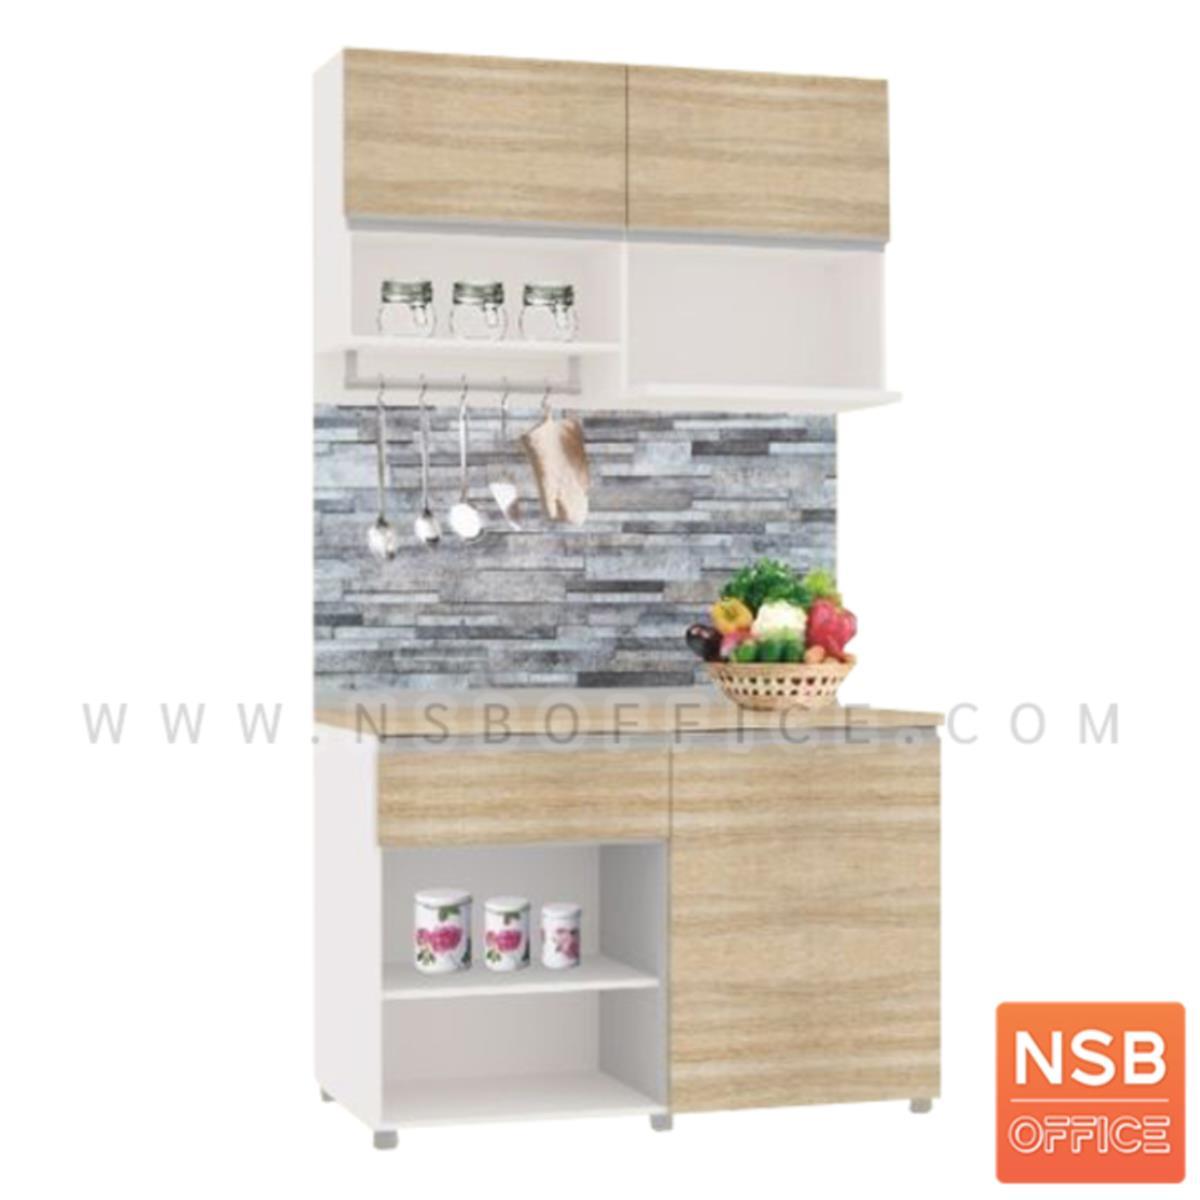 K05A012:ชุดตู้ครัวพร้อมตู้แขวน 1 บานเปิก 1 ลิ้นชัก รุ่น Brinley (บรินลี) ขนาด 120W cm. สีเนเจอร์ทีค-ขาว